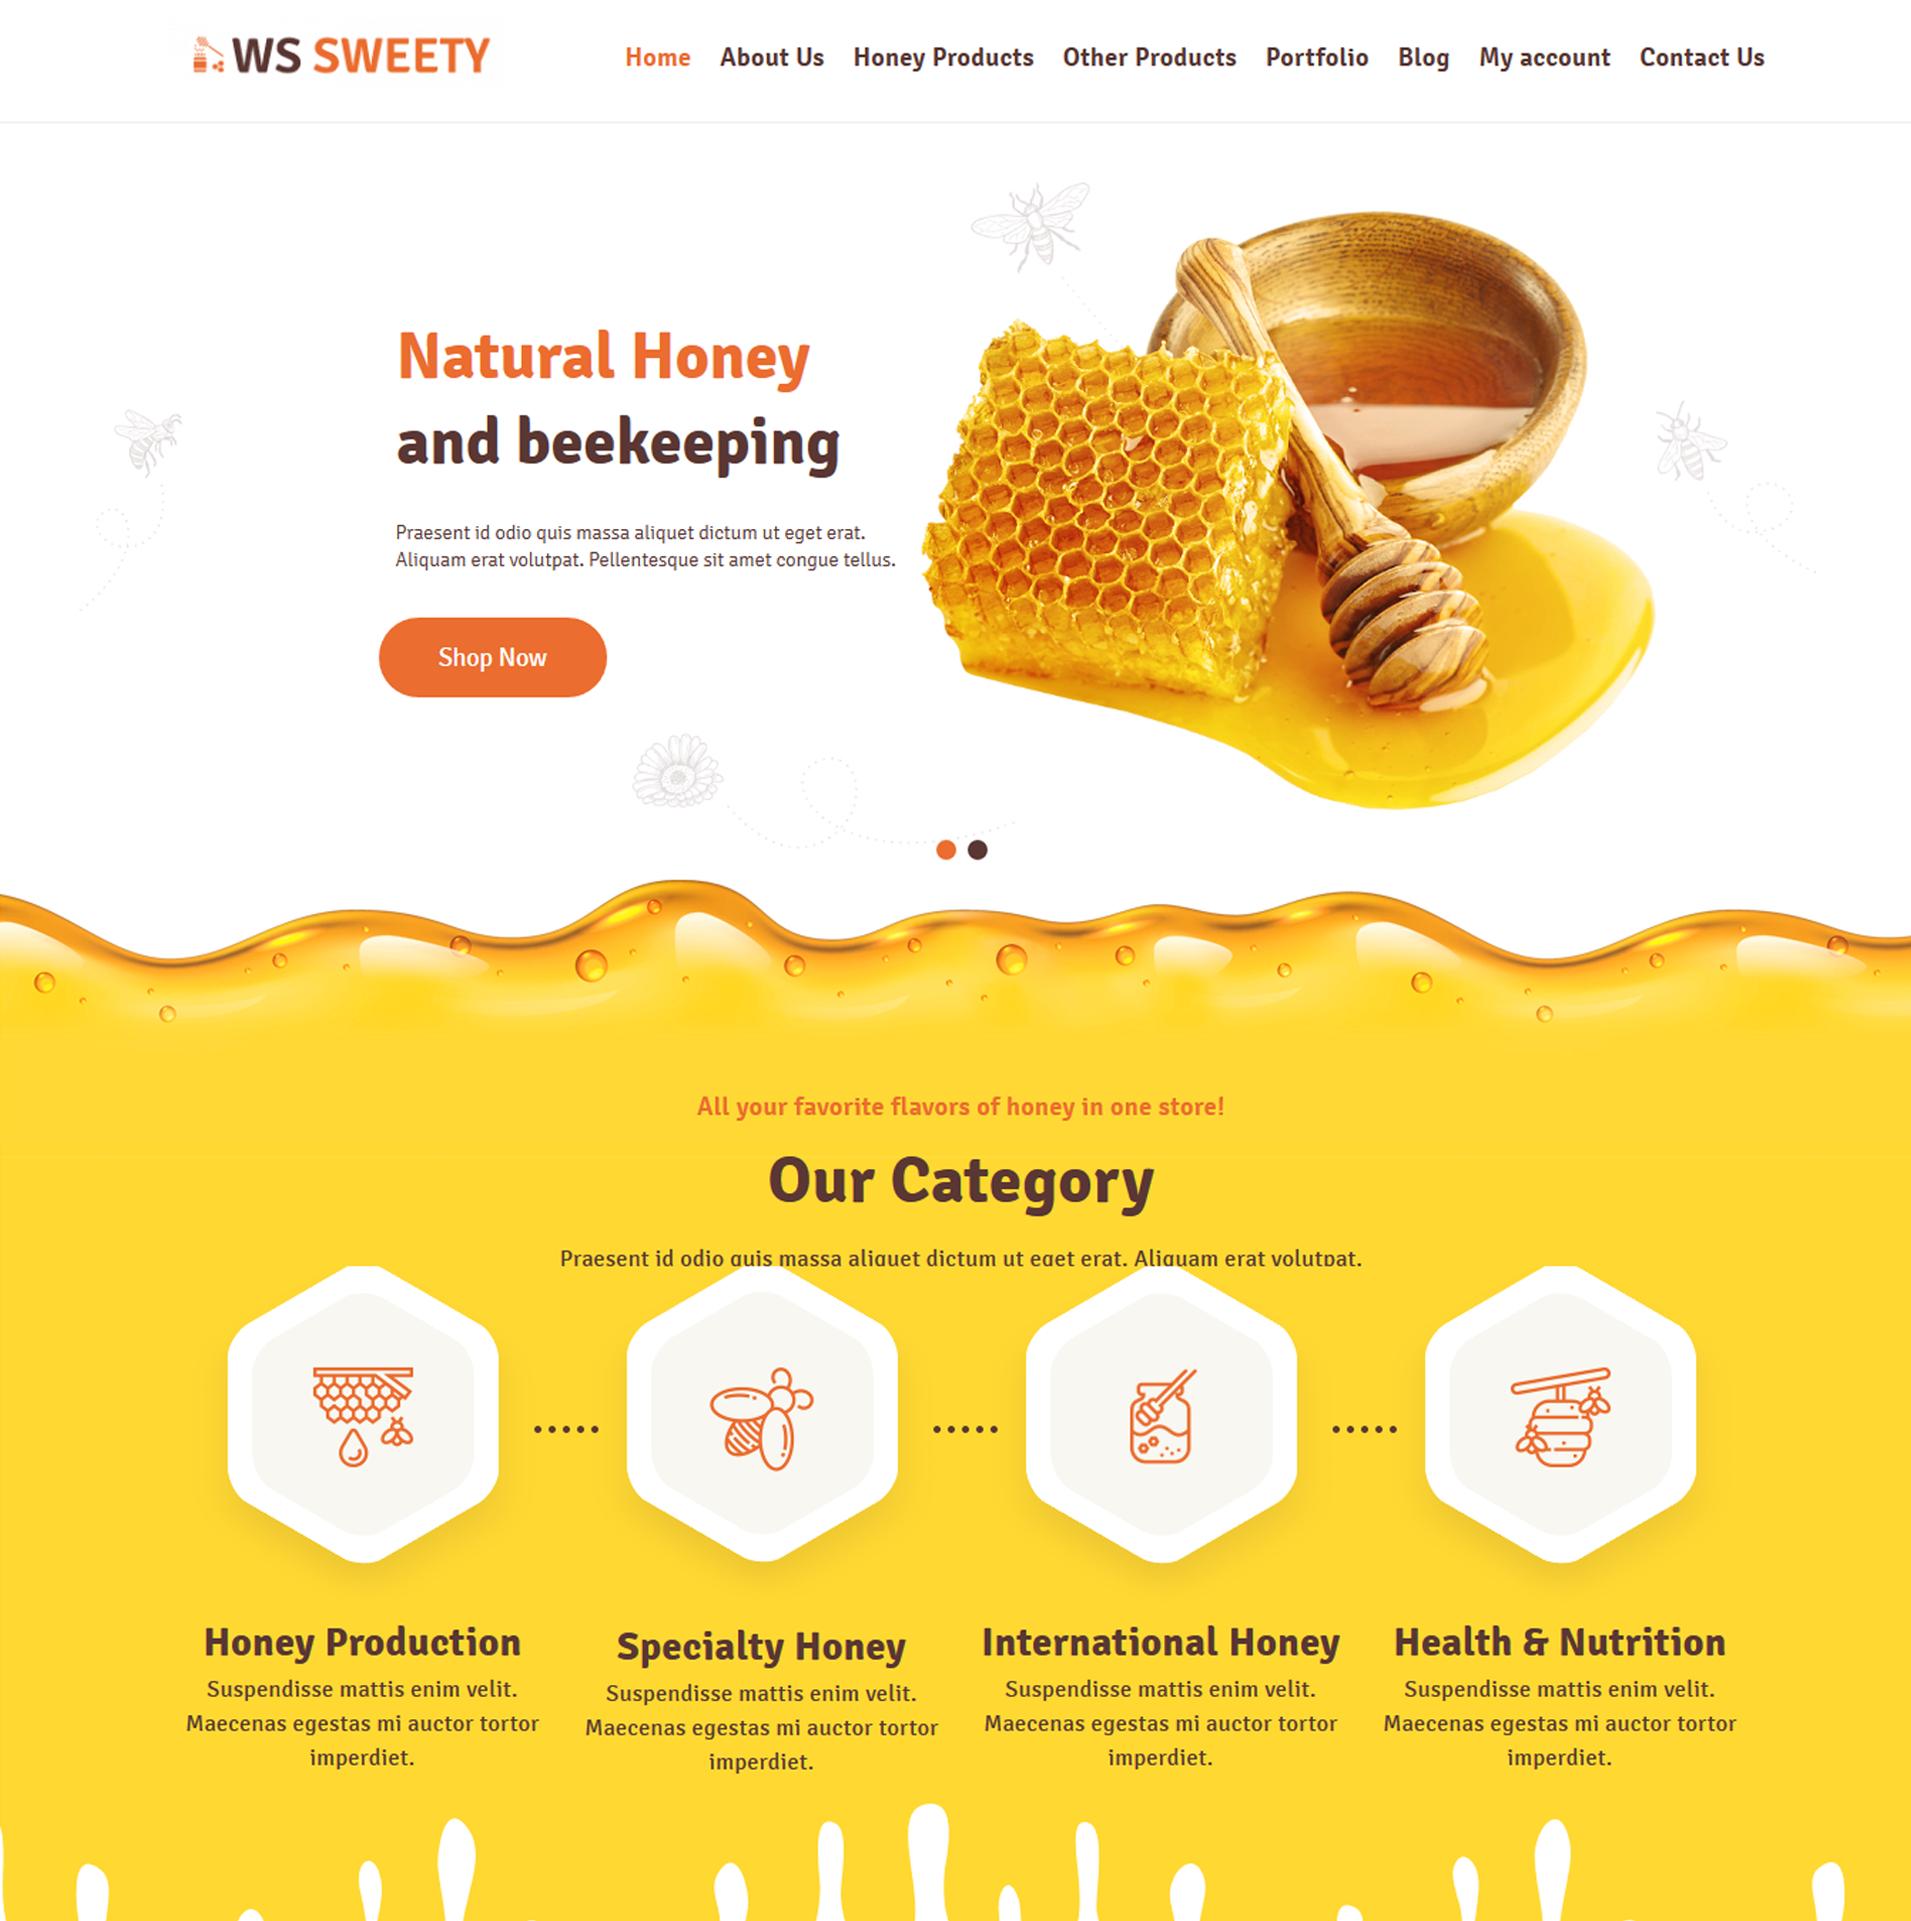 ws-sweety-free-responsive-wordpress-theme-screen